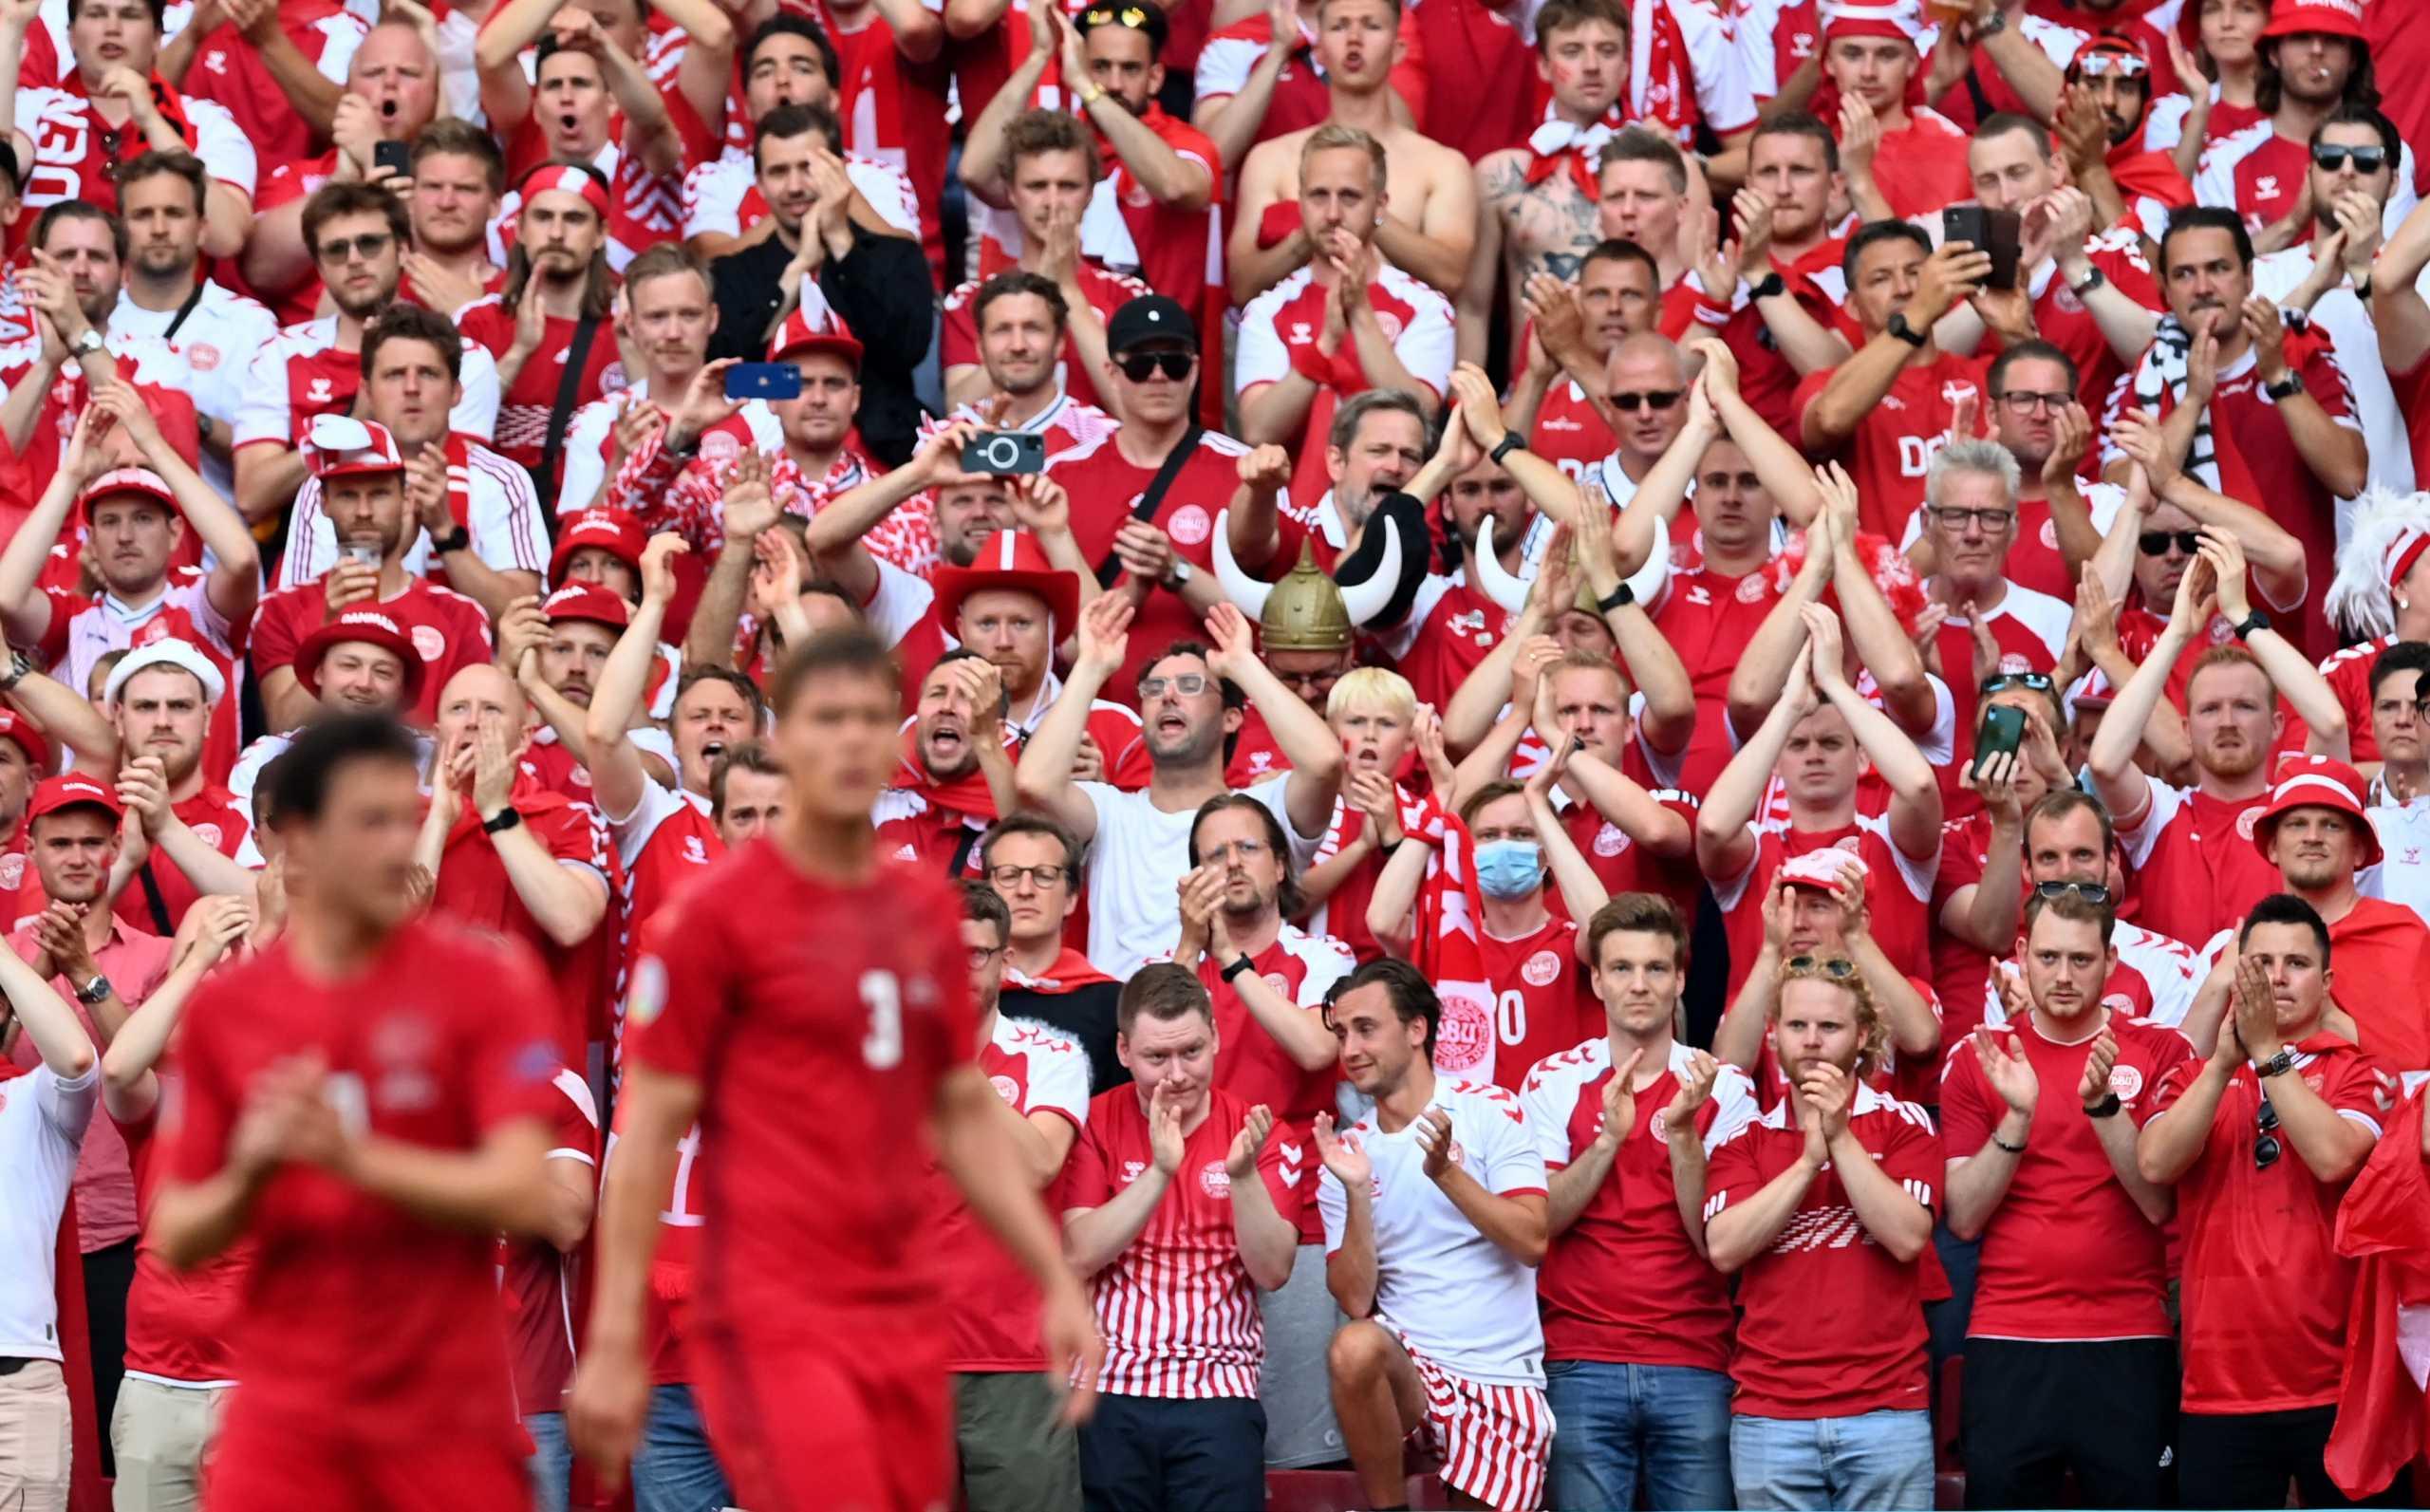 Euro 2020: Η χαλάρωση των μέτρων στα γήπεδα φέρνει αύξηση κρουσμάτων που ανησυχεί τον ΠΟΥ